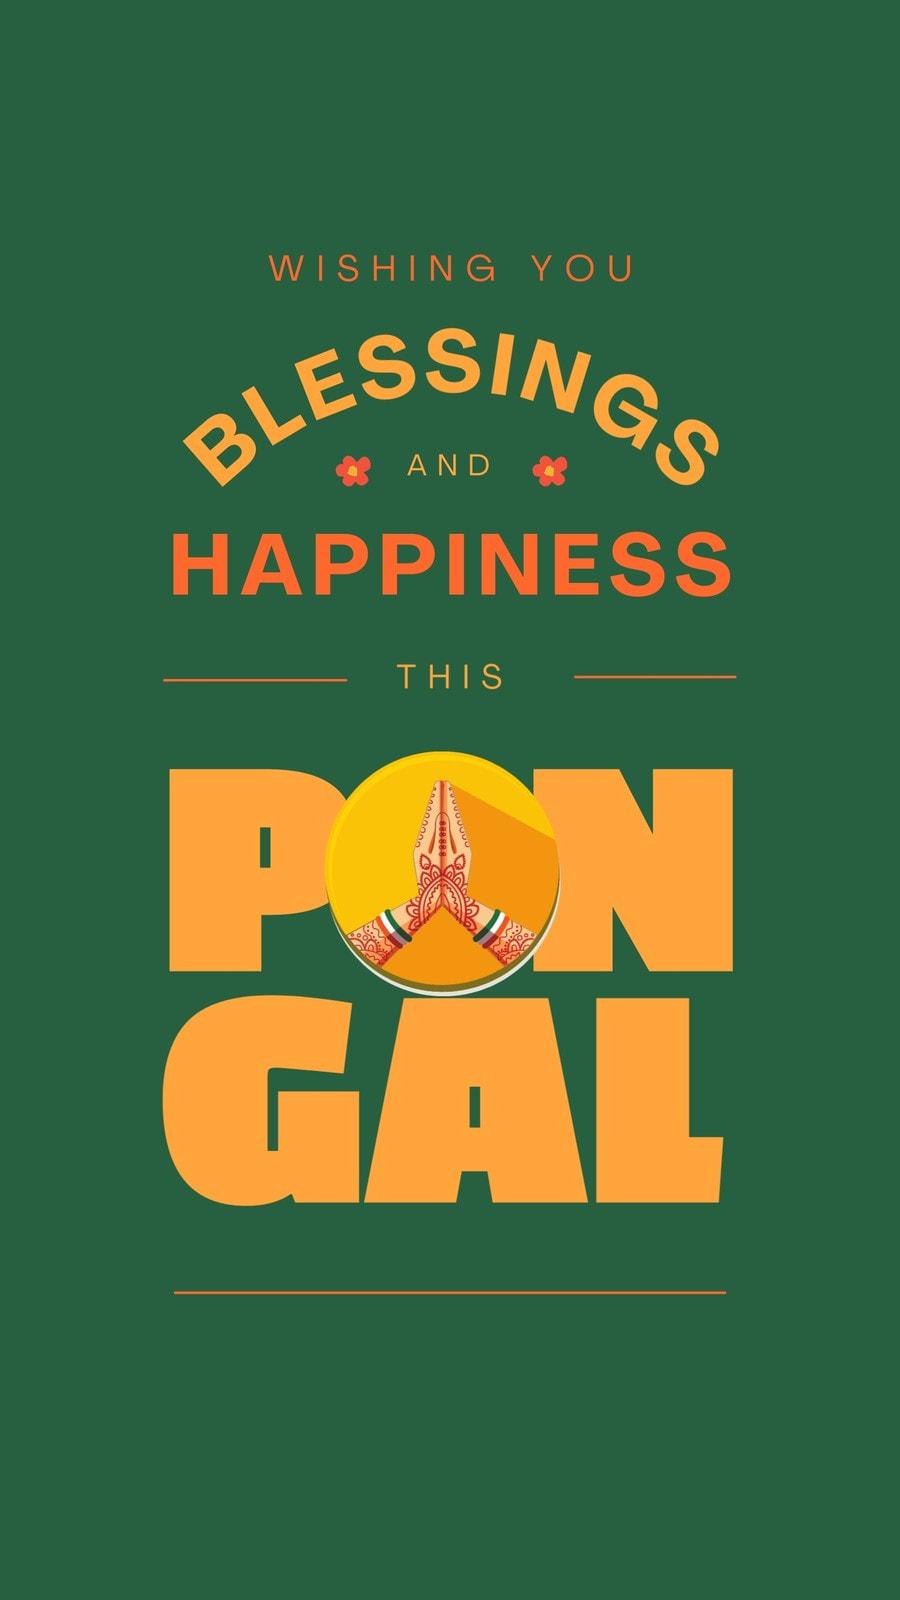 Green and Orange Maximalist Pongal Festival Greeting Tik Tok